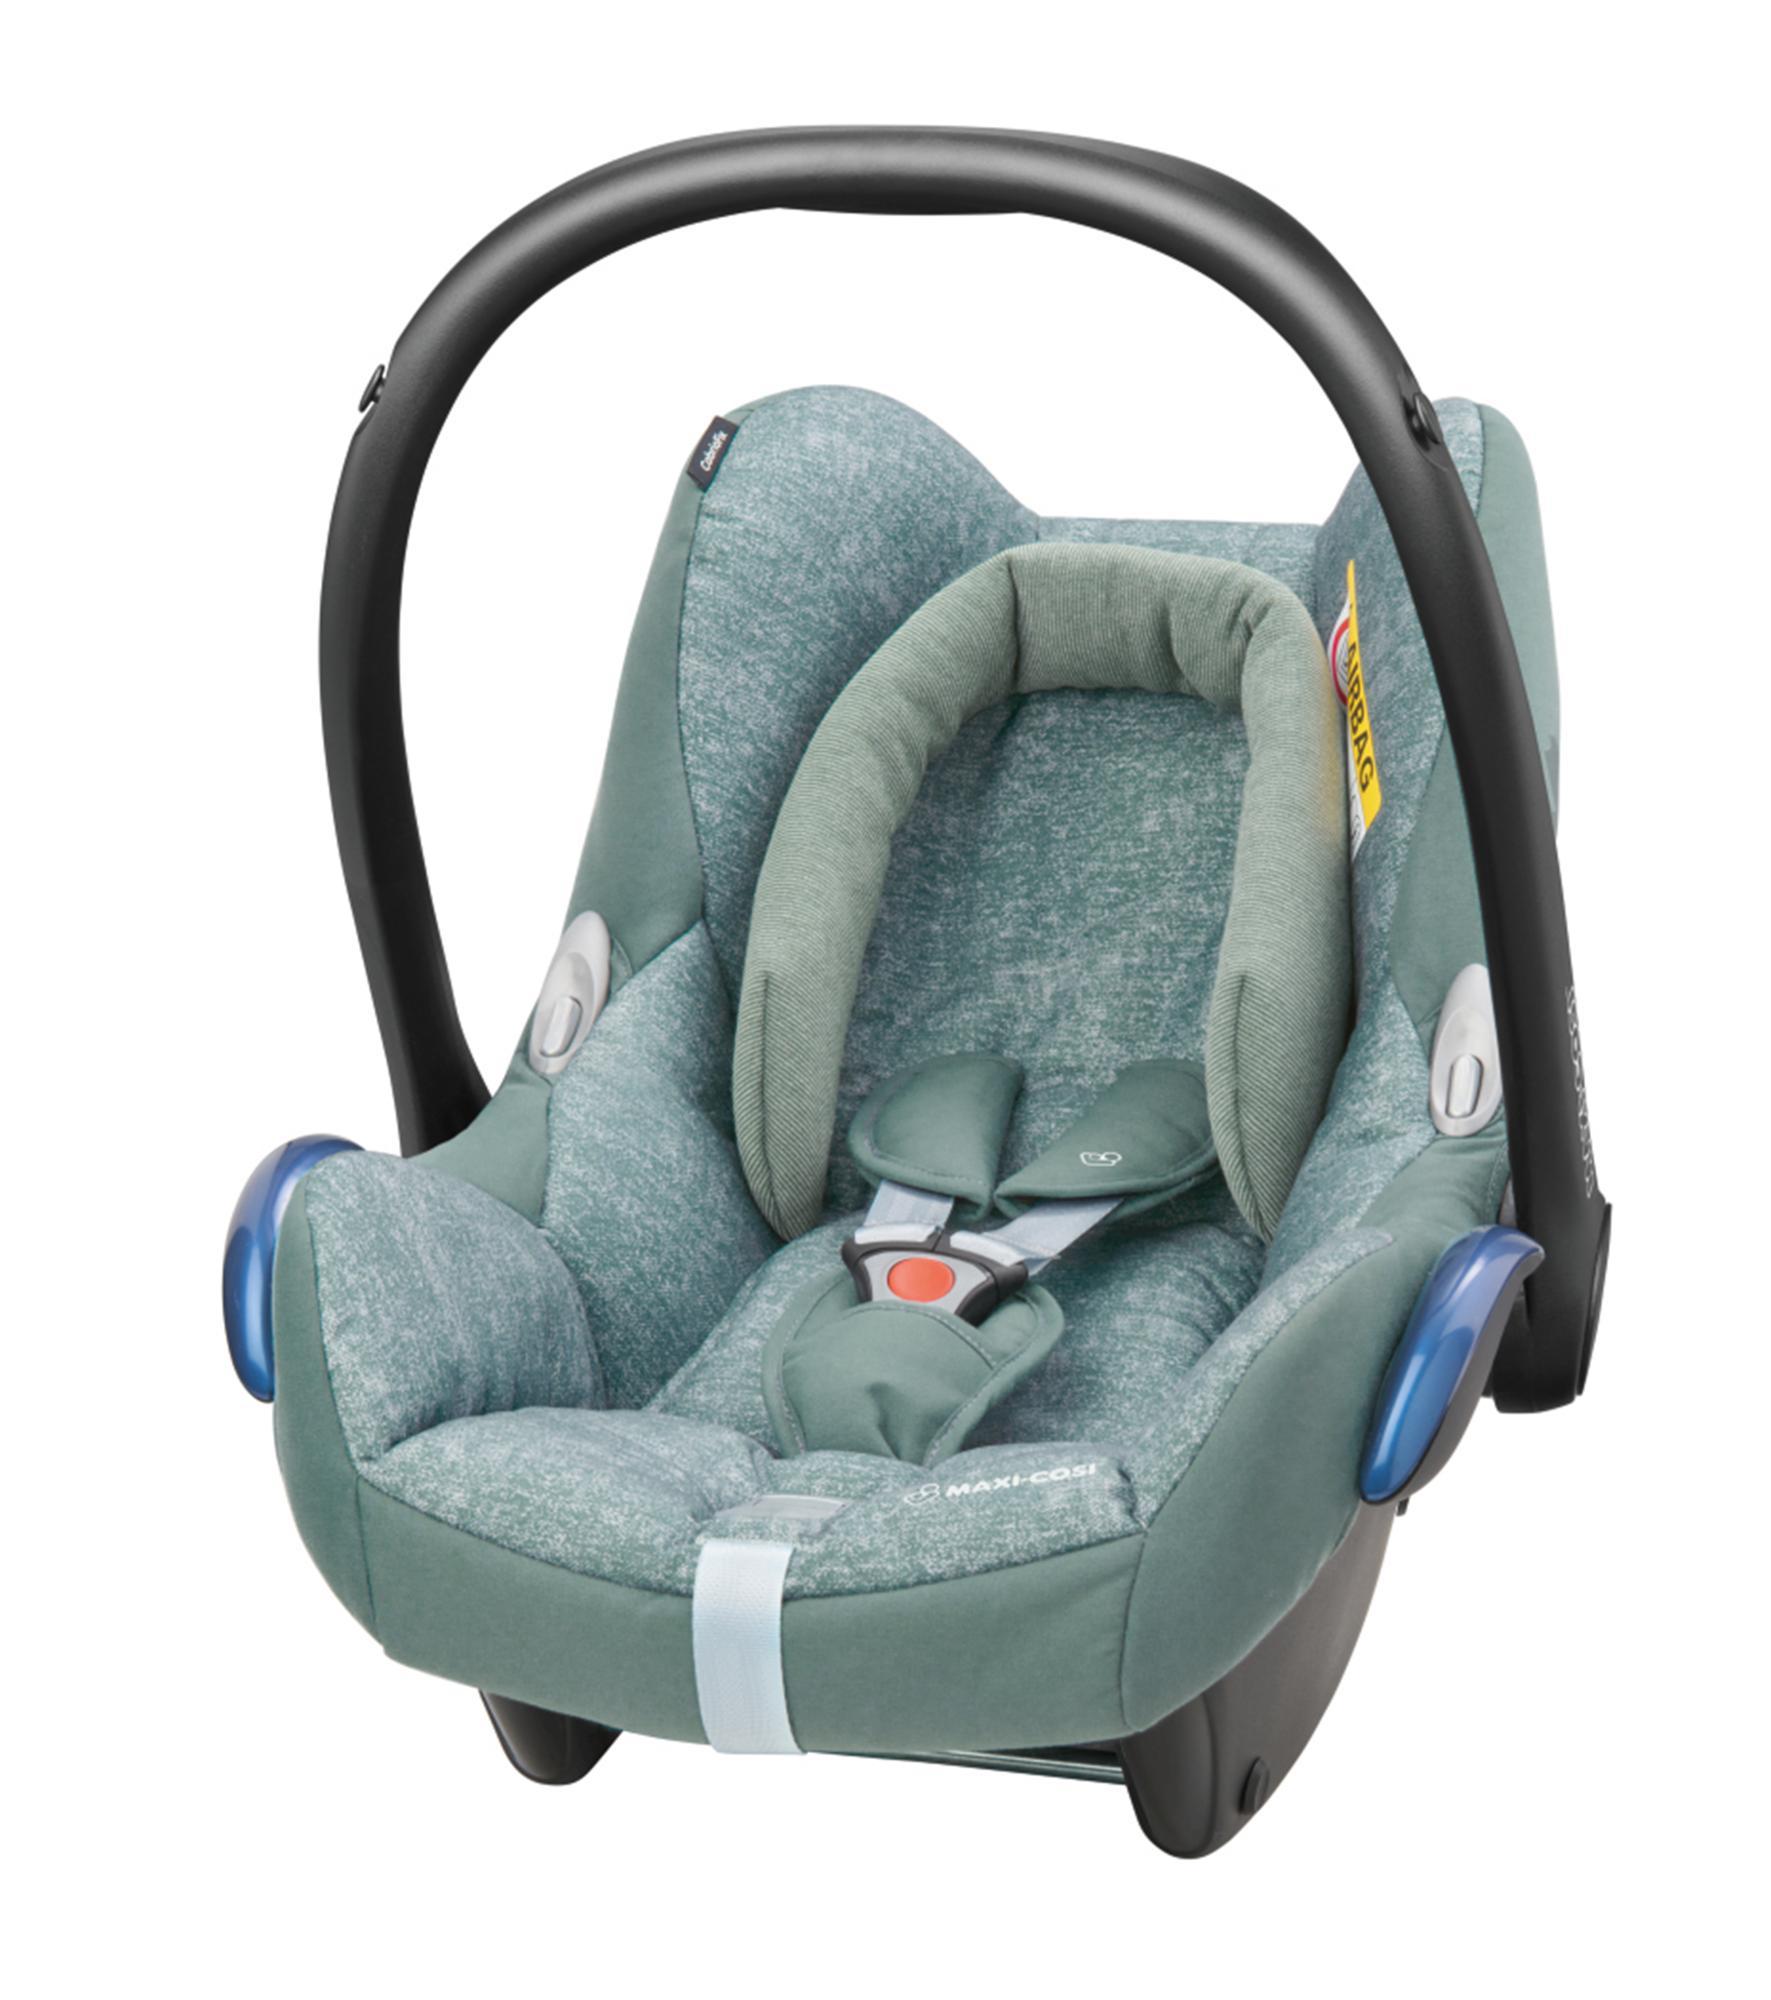 MAXI COSI CABRIOFIX Nomad Green Bērnu autosēdeklis 0-13 kg